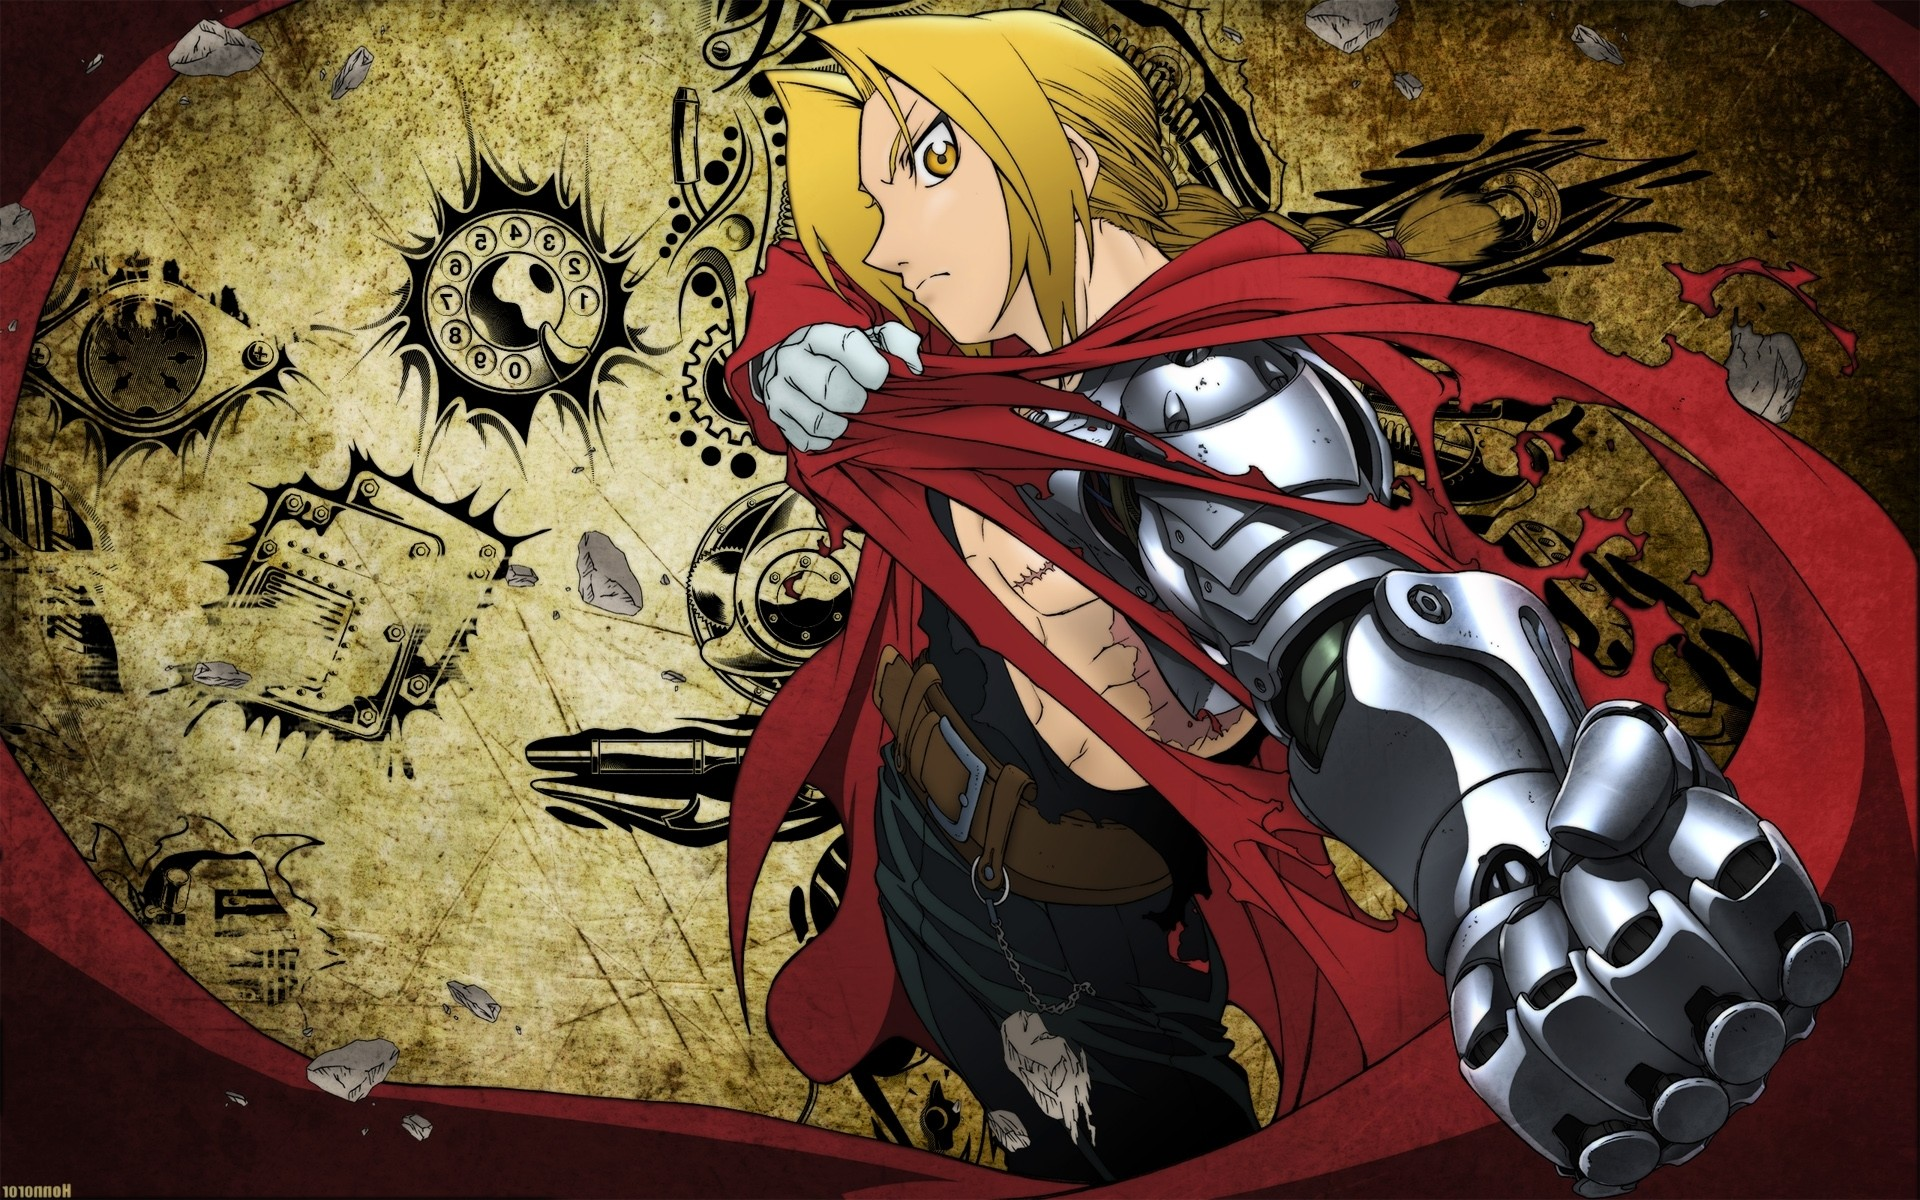 Fullmetal Alchemist HD Wallpaper (68+ pictures)